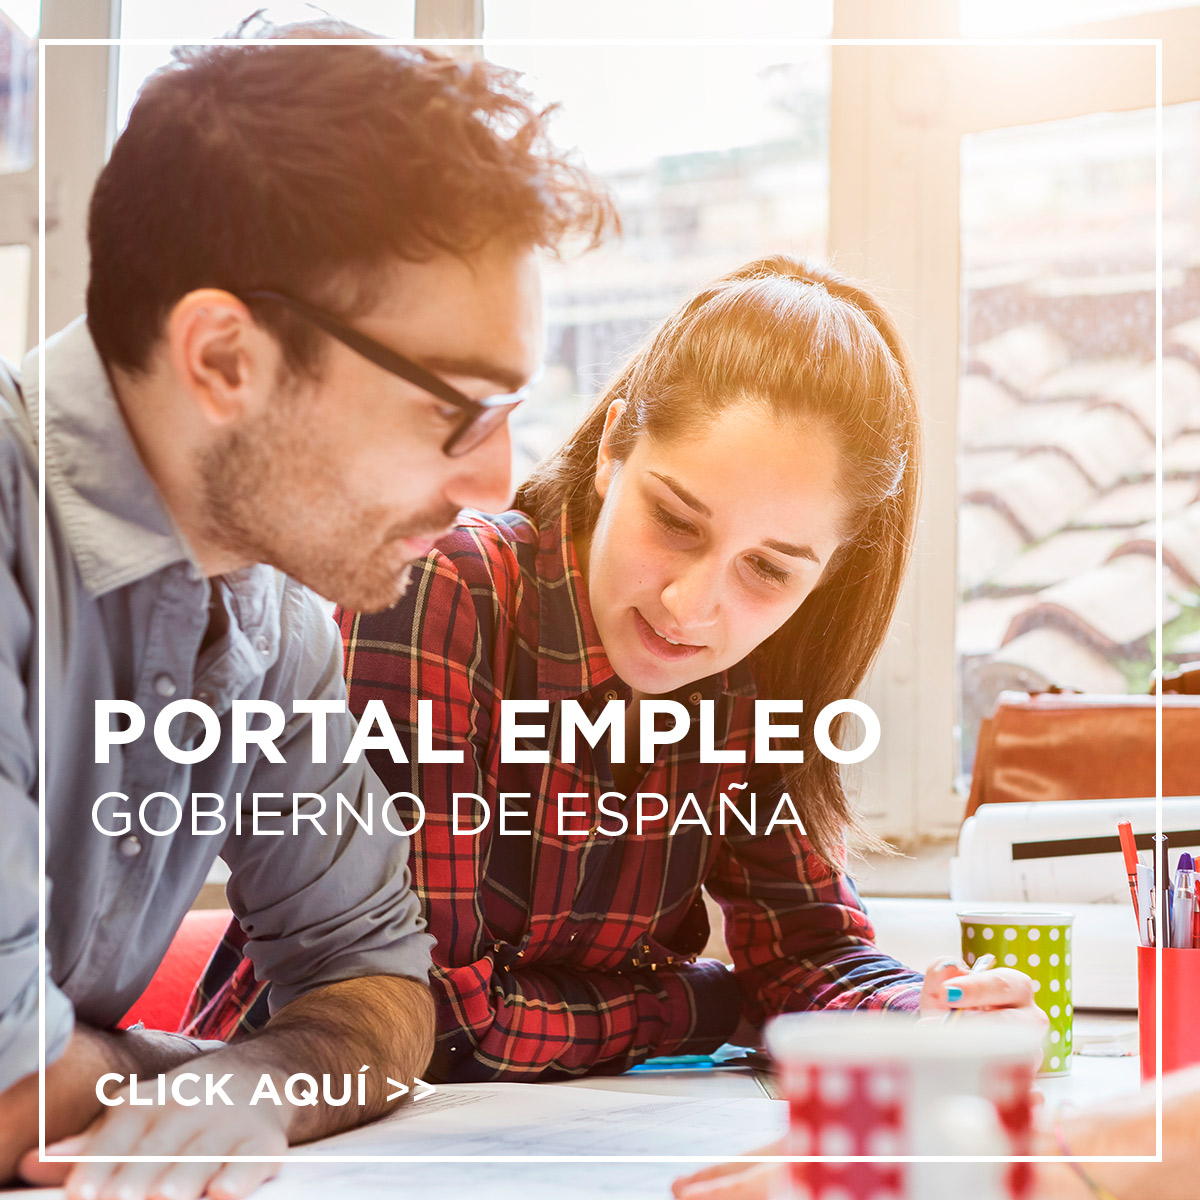 Portal Empleo Gobierno de España